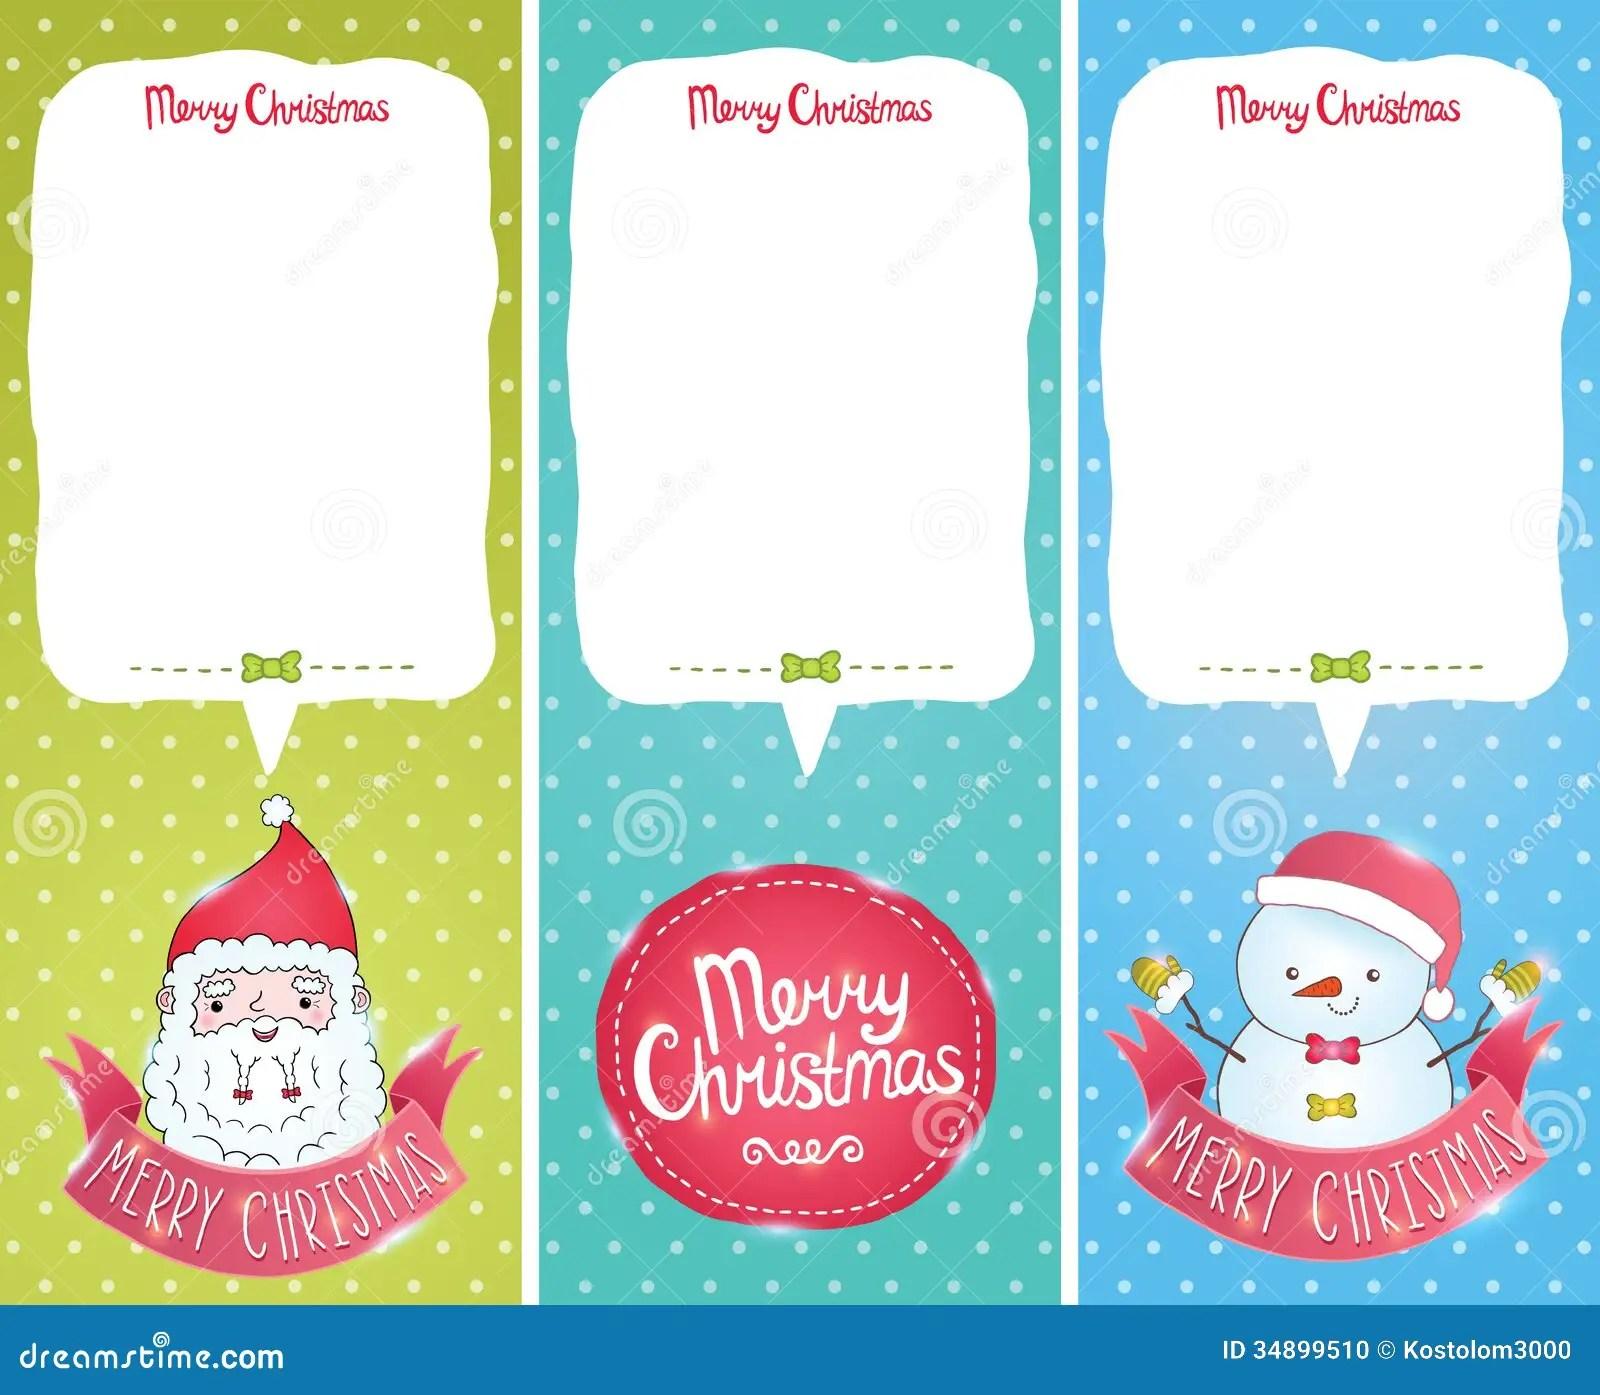 Christmas Cards With Santa Claus Snowman Stock Vector